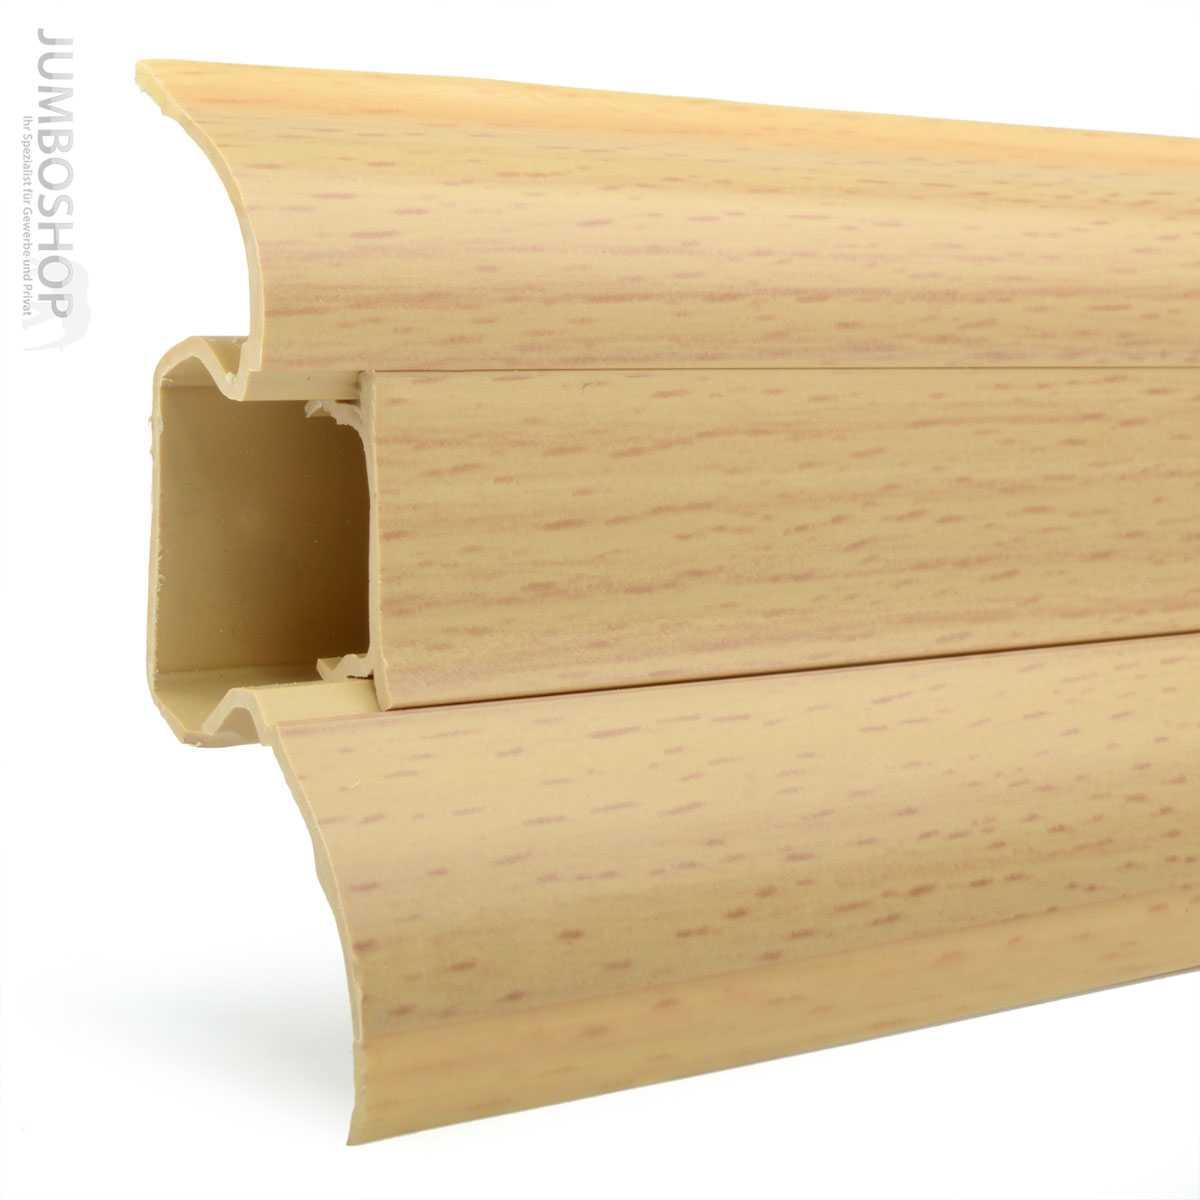 fu leiste mit kabelkanal kabelkanal sockelleisten eiche. Black Bedroom Furniture Sets. Home Design Ideas